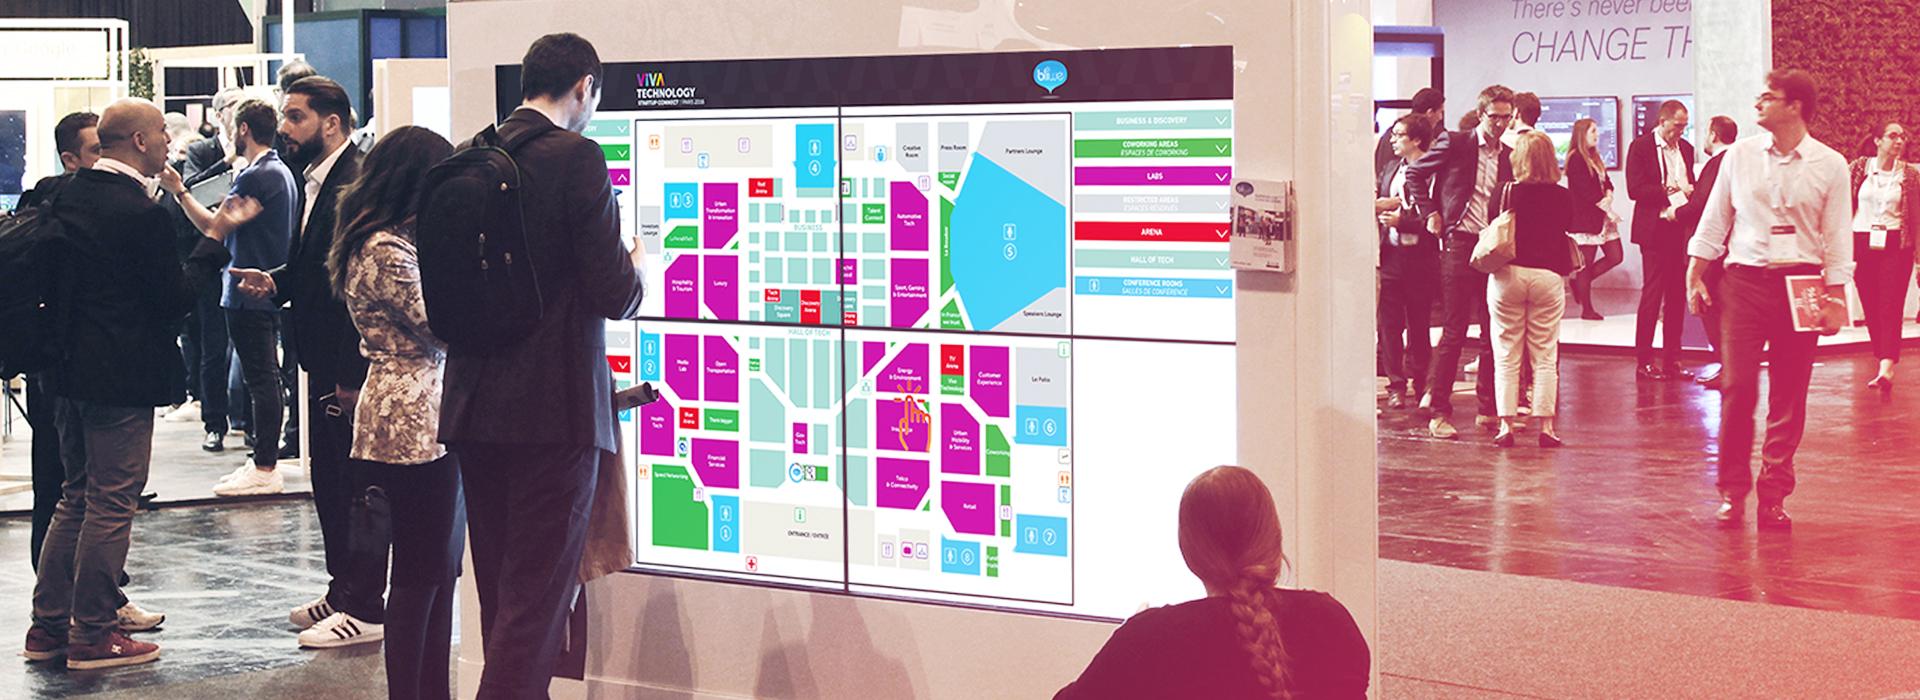 ecran-tactile-de-grande-taille-plan-interactif